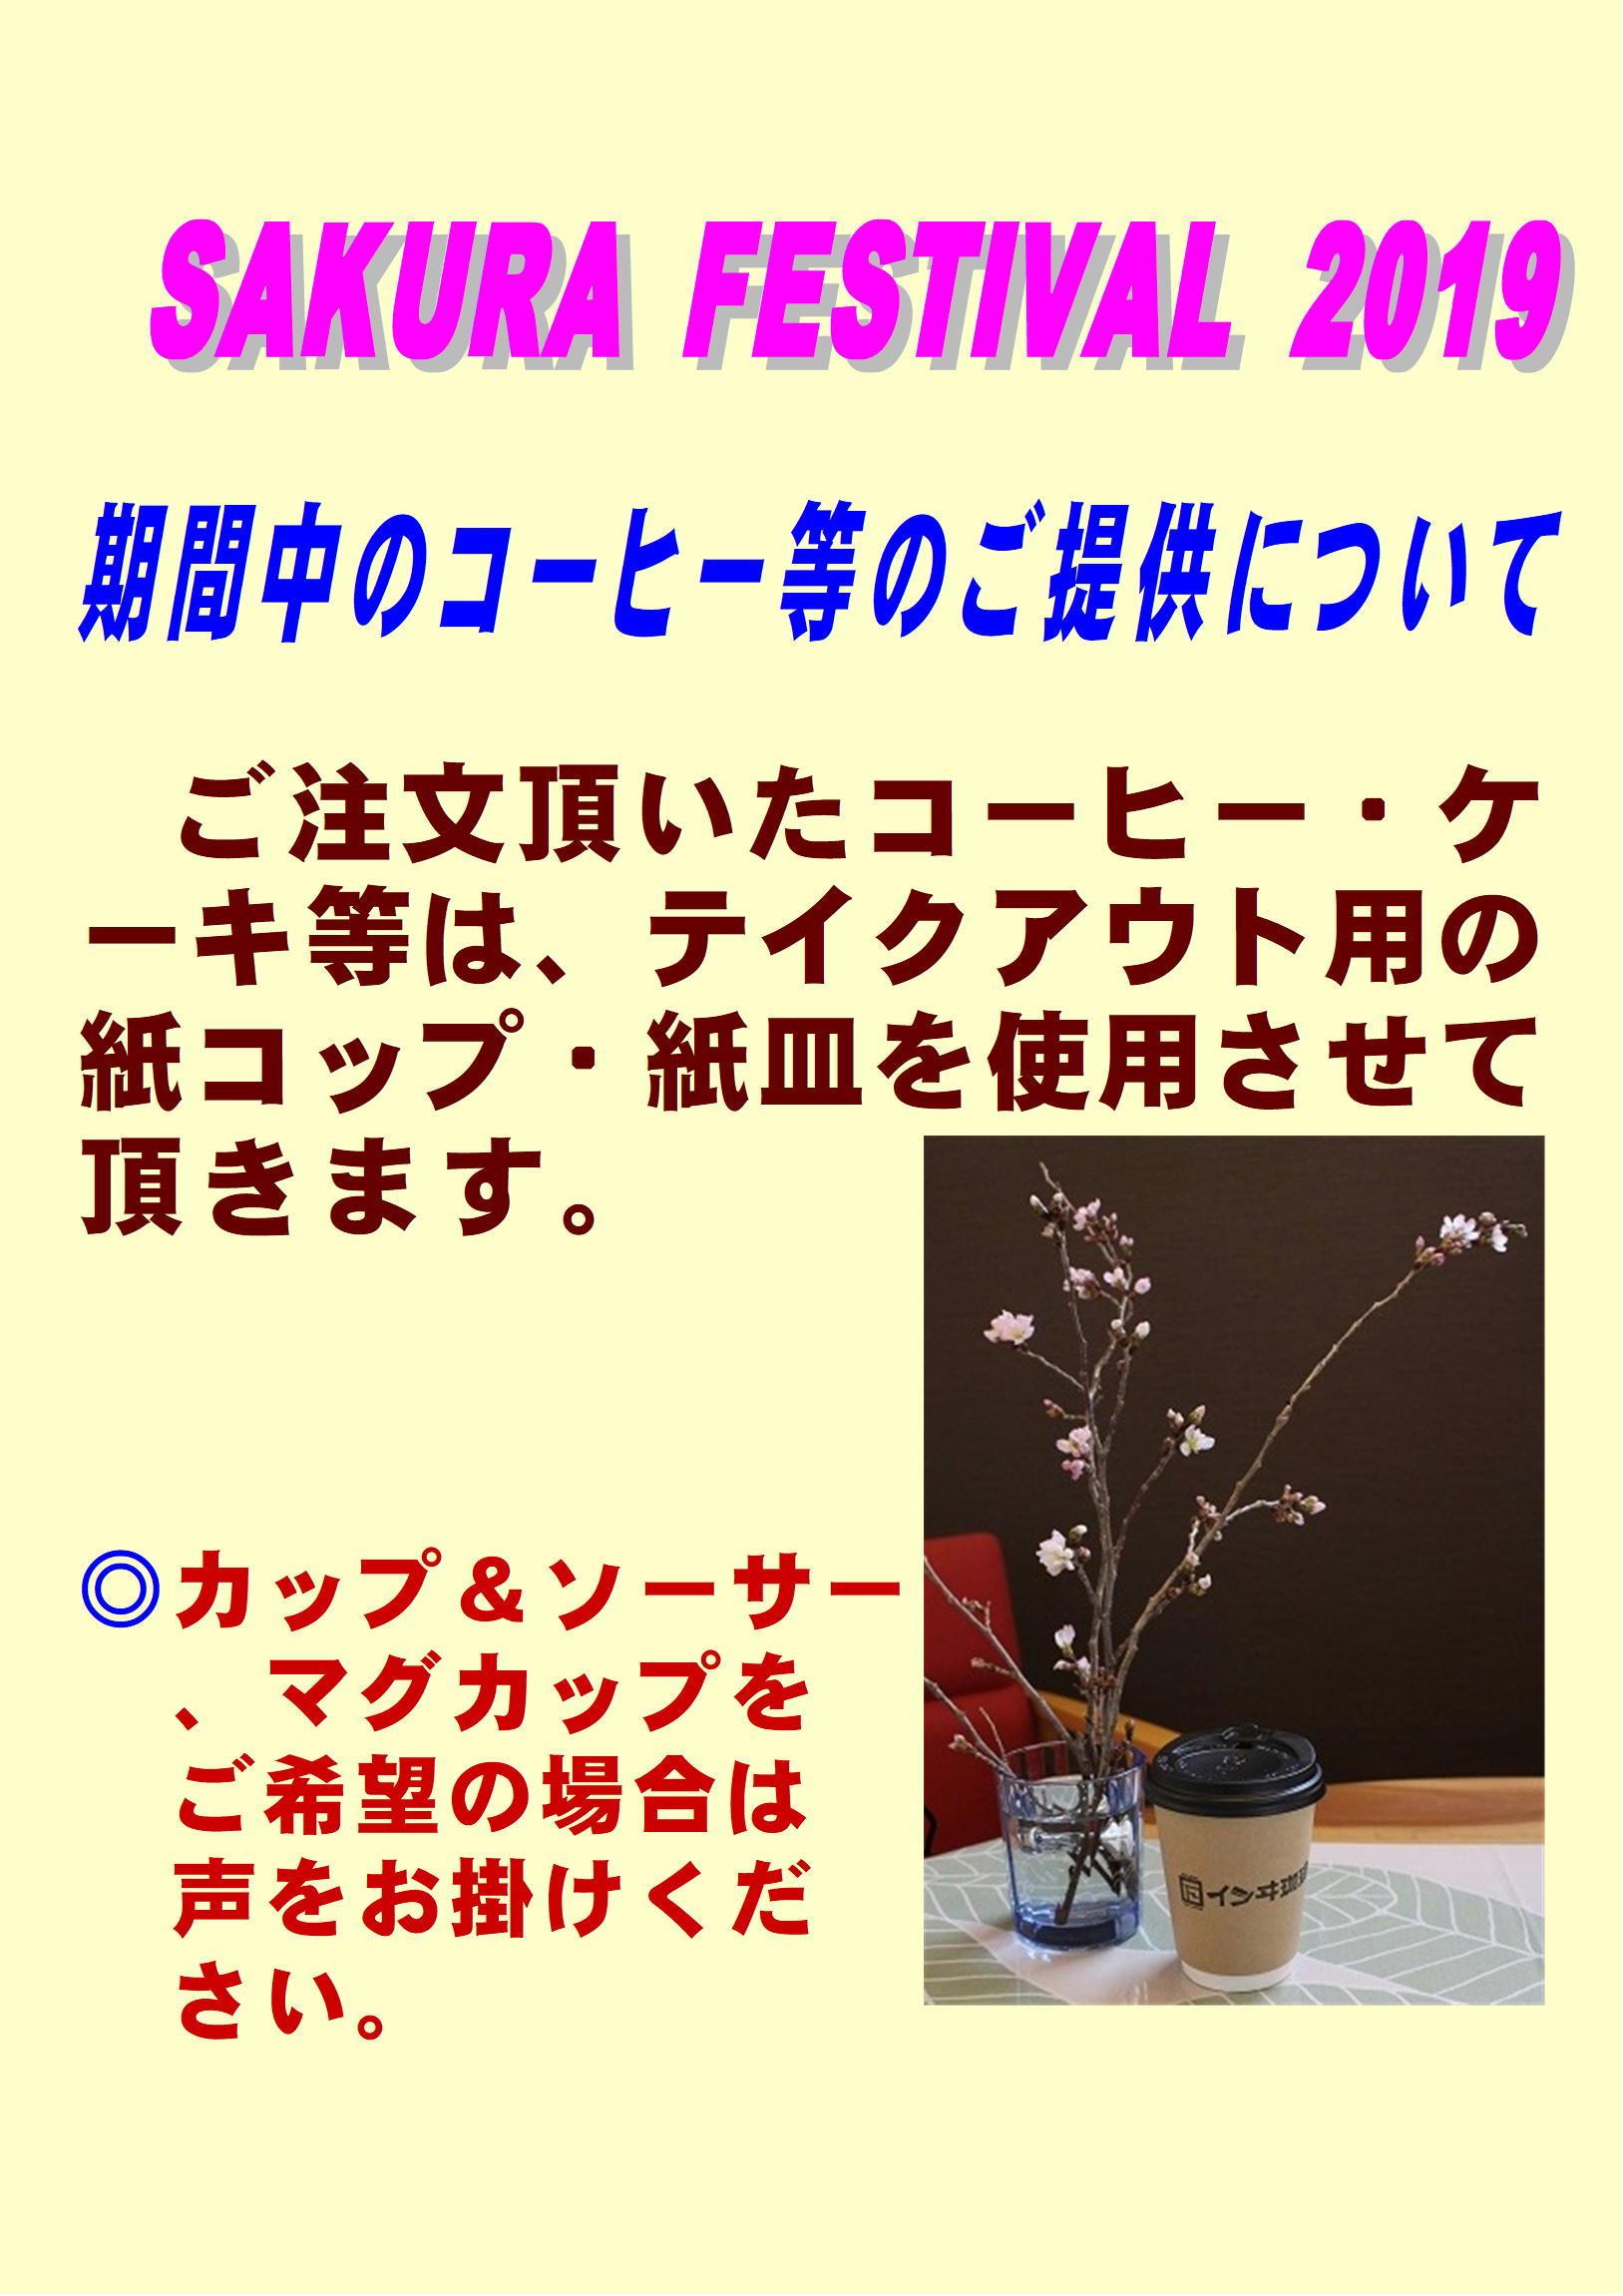 SAKURA FESTIVAL 2019 のお知らせ_d0237446_17273830.jpg